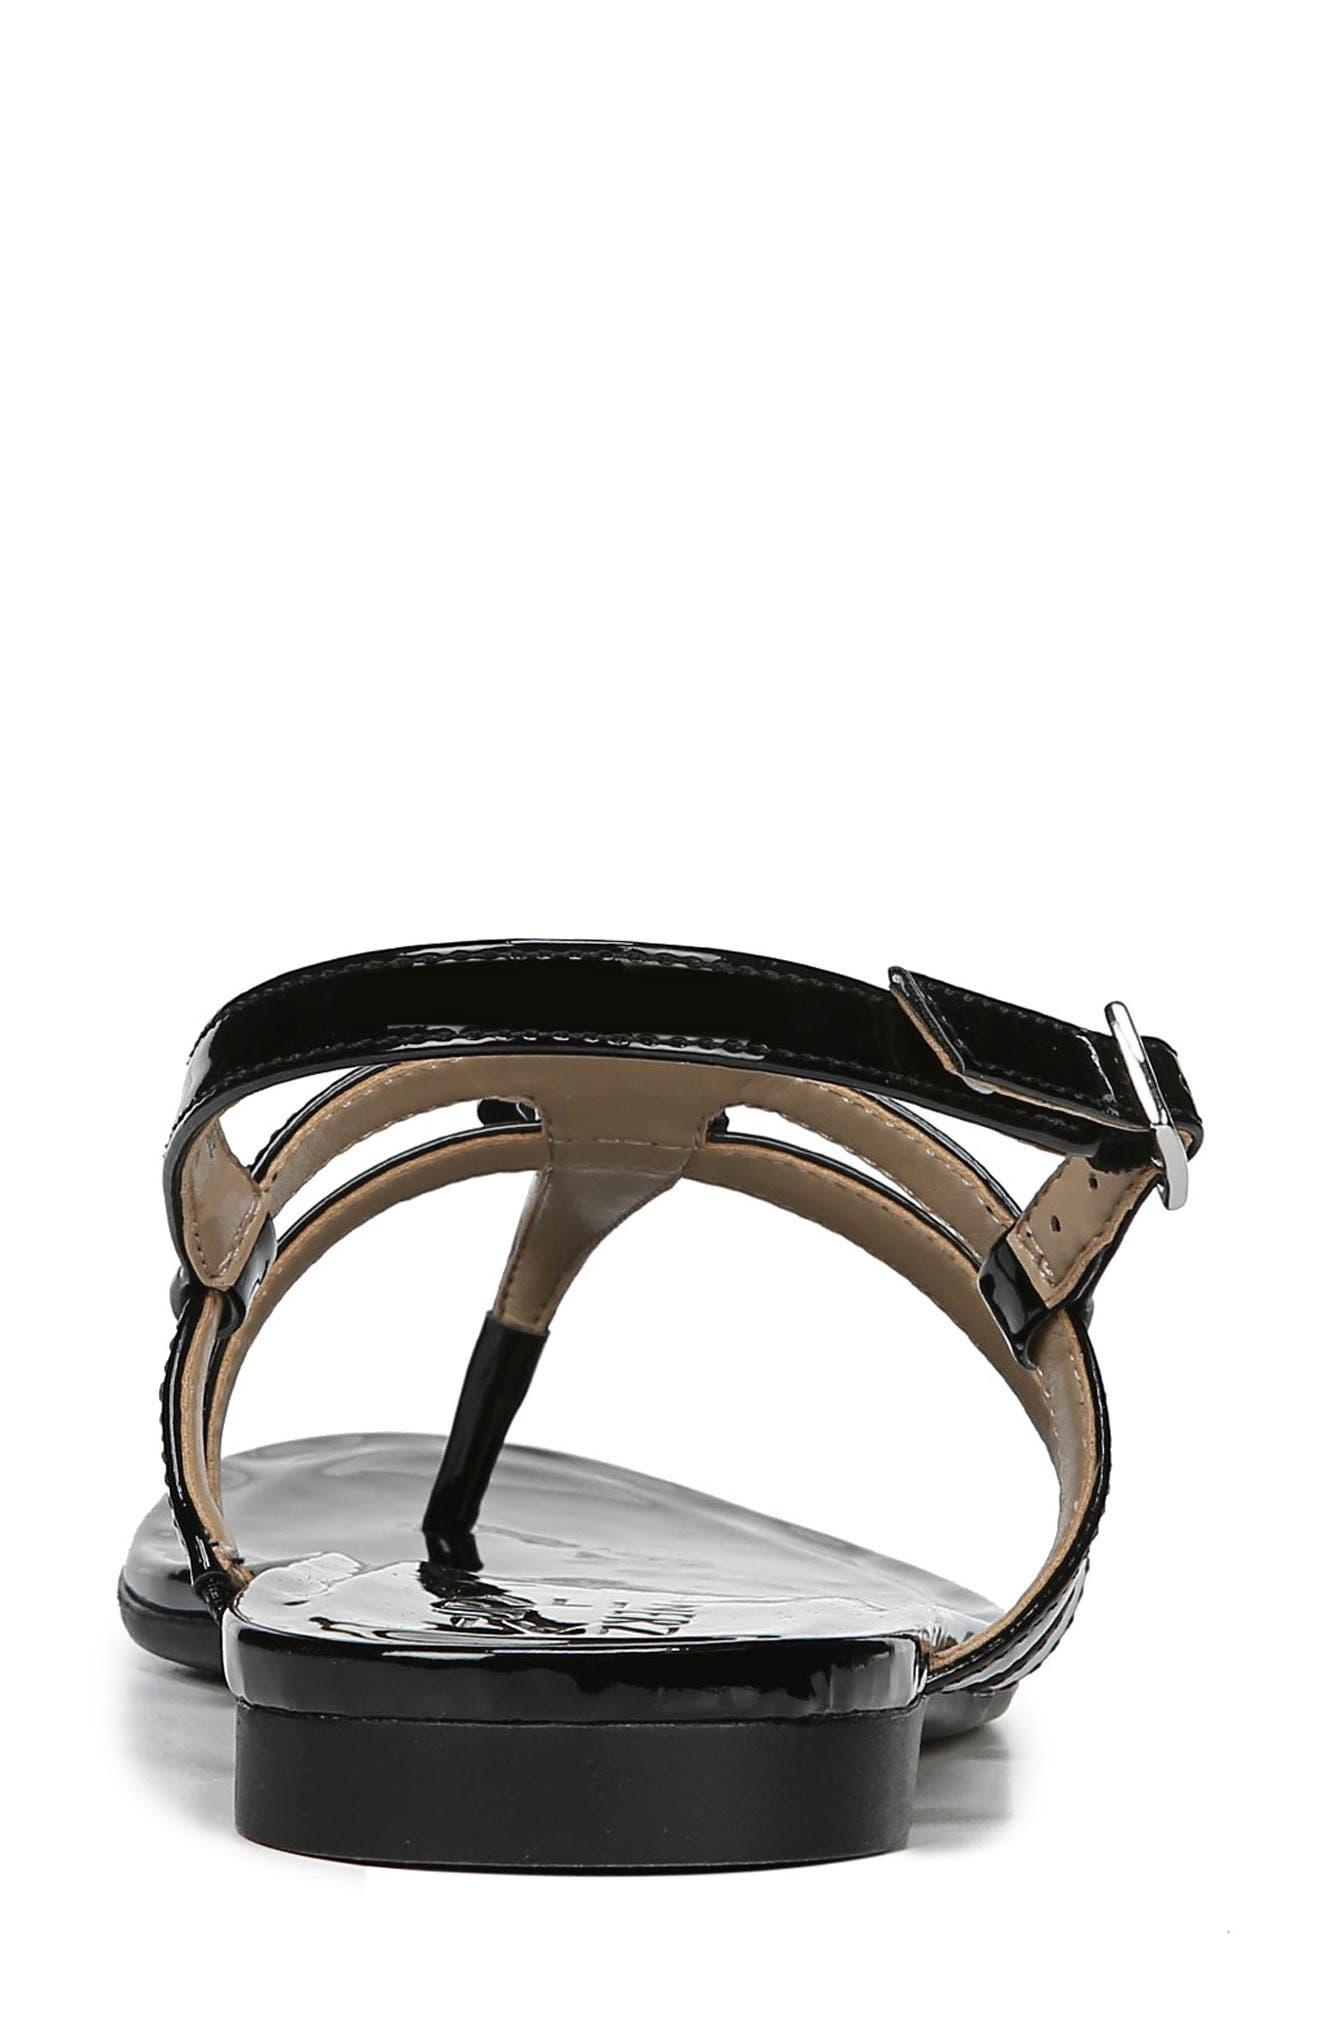 Tilly Embellished Sandal,                             Alternate thumbnail 7, color,                             BLACK PATENT FAUX LEATHER